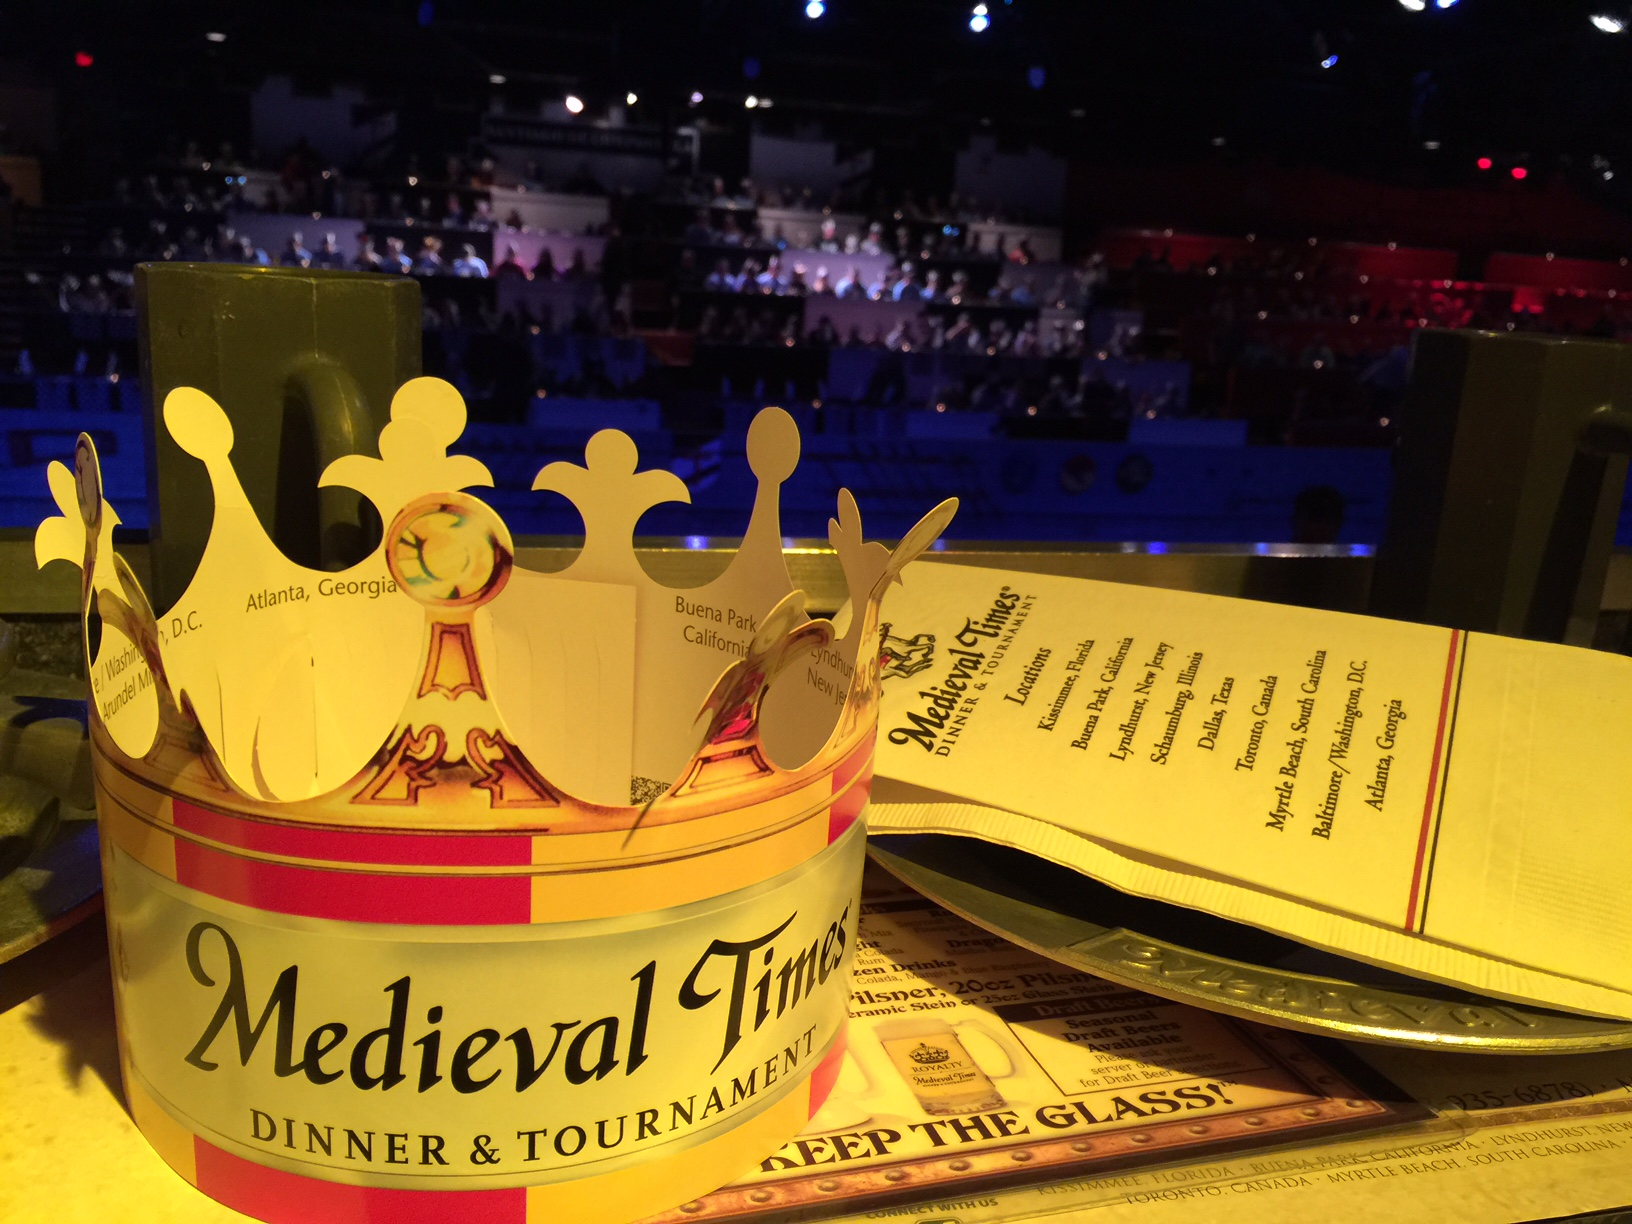 Medieval times coupons orlando florida